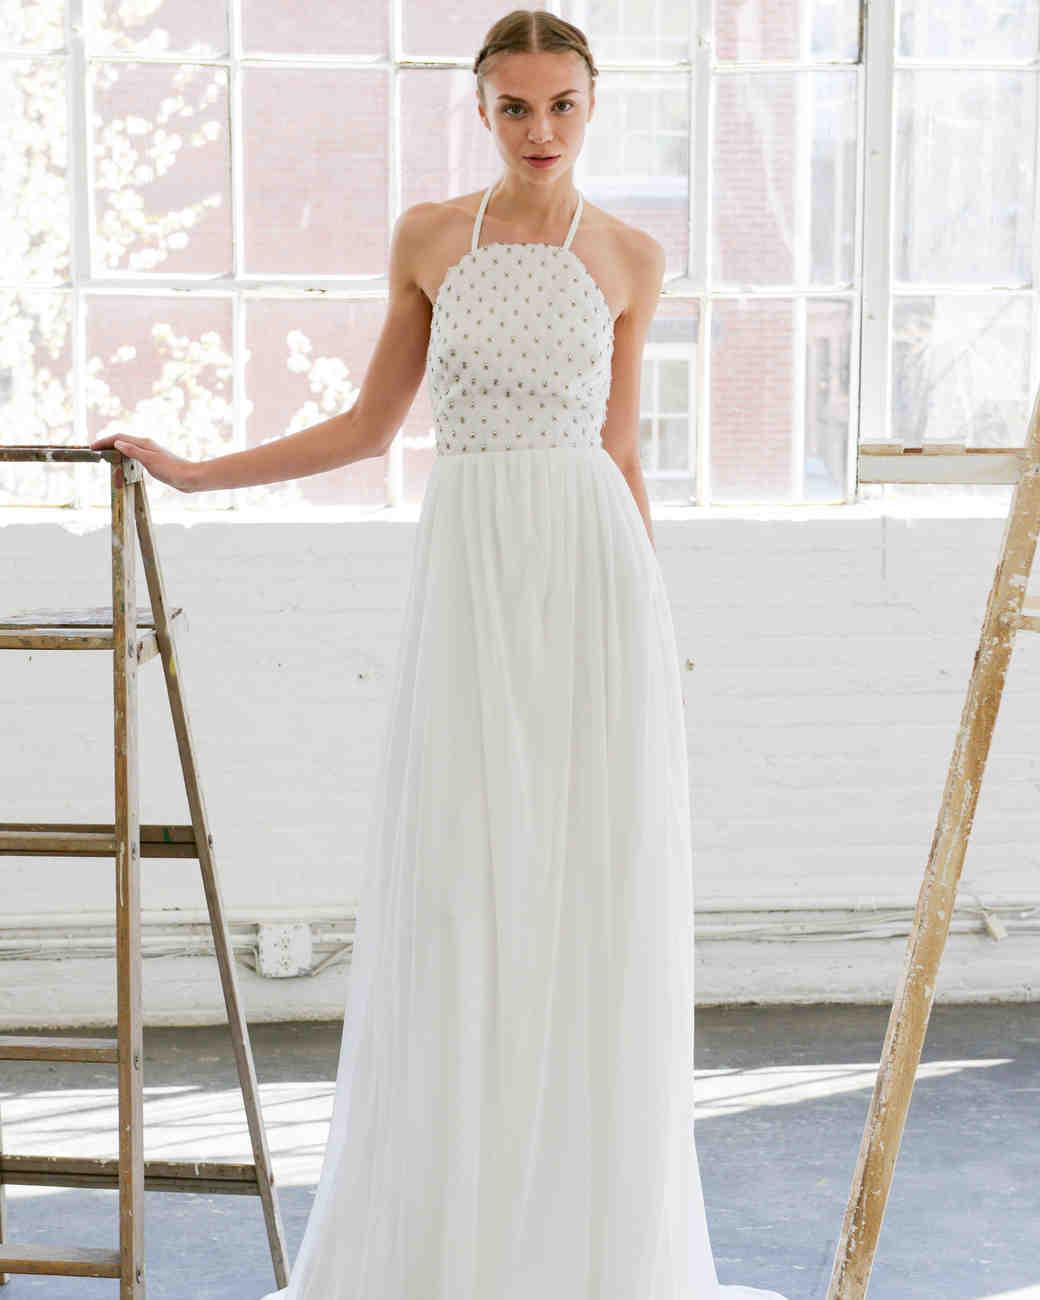 Lela Rose simple Halter Neck Wedding Dress